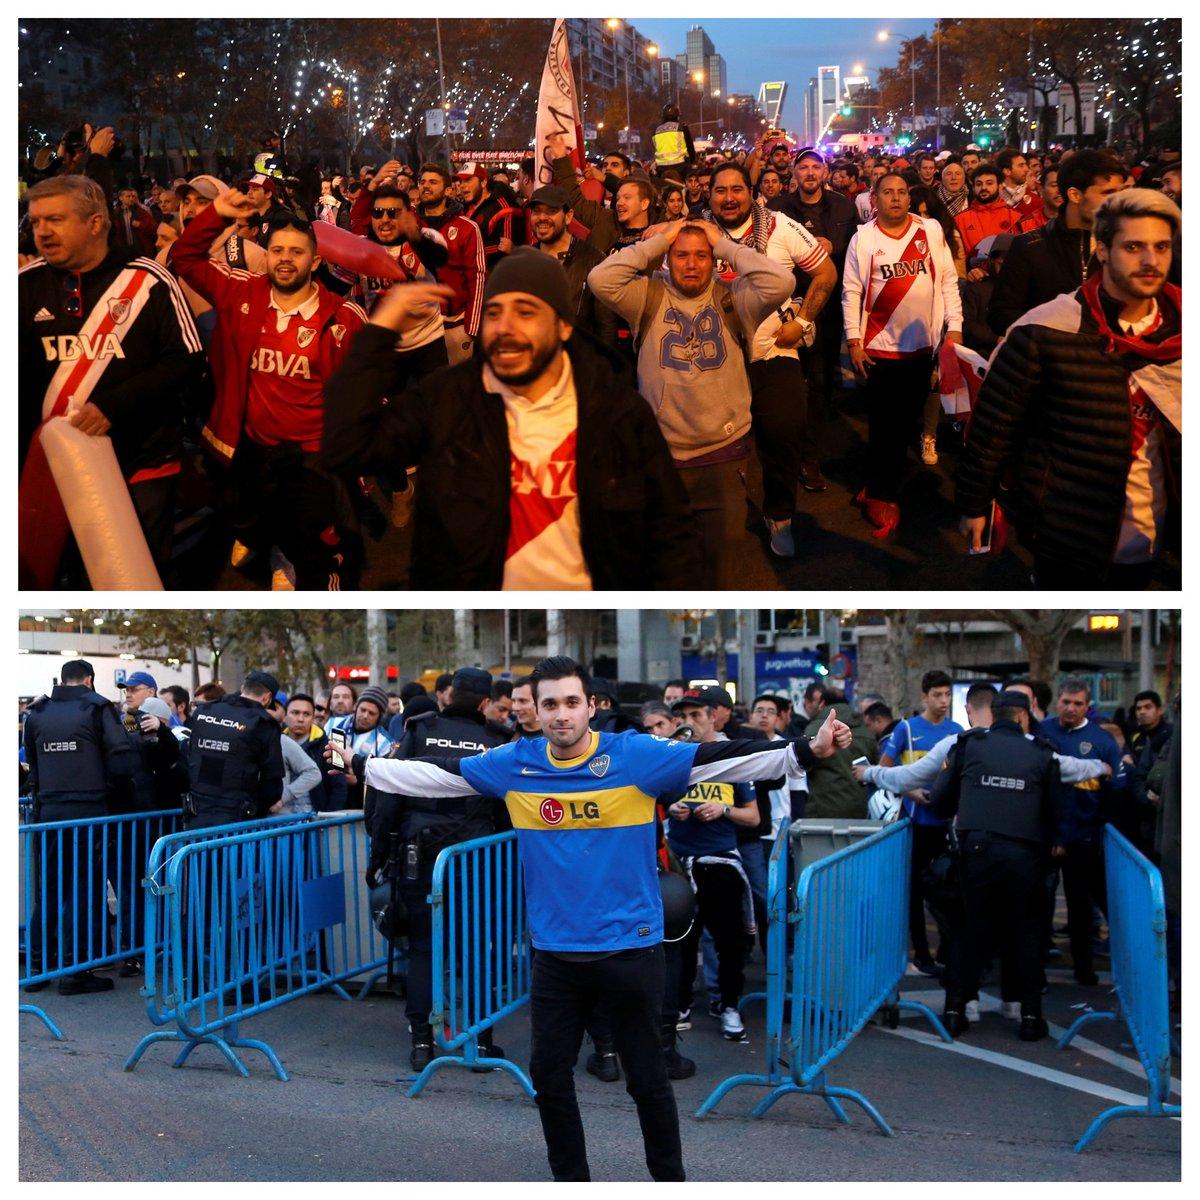 Se liga no clima para a final da Libertadores, entre River Plate e Boca Juniors https://t.co/wpW8shTQAn